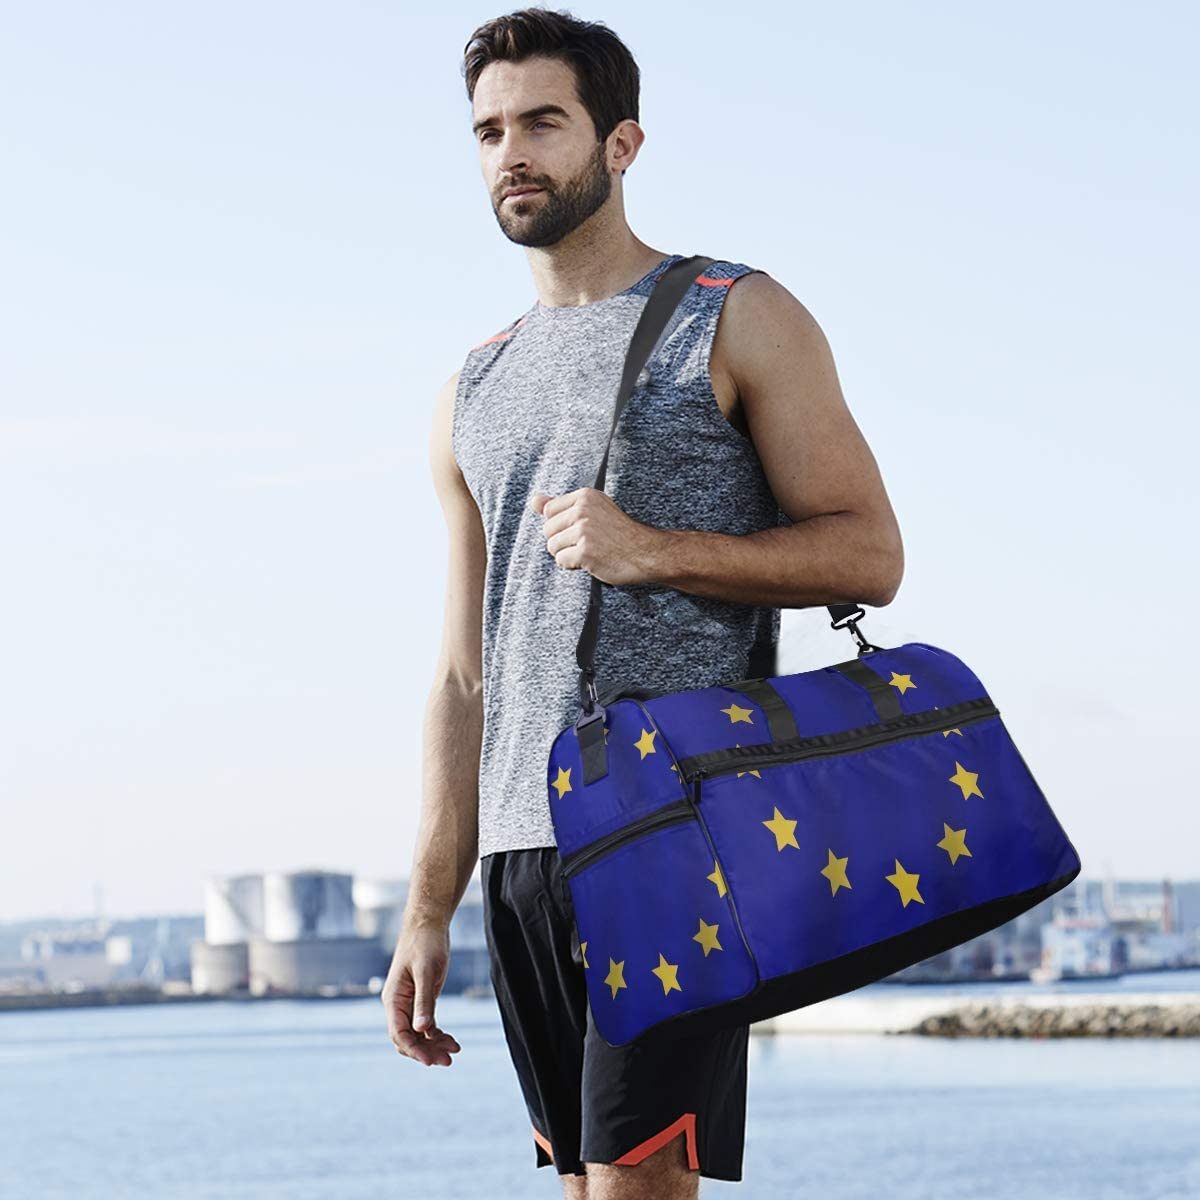 Travel Duffels Misc European Union Flag Duffle Bag Luggage Sports Gym for Women /& Men